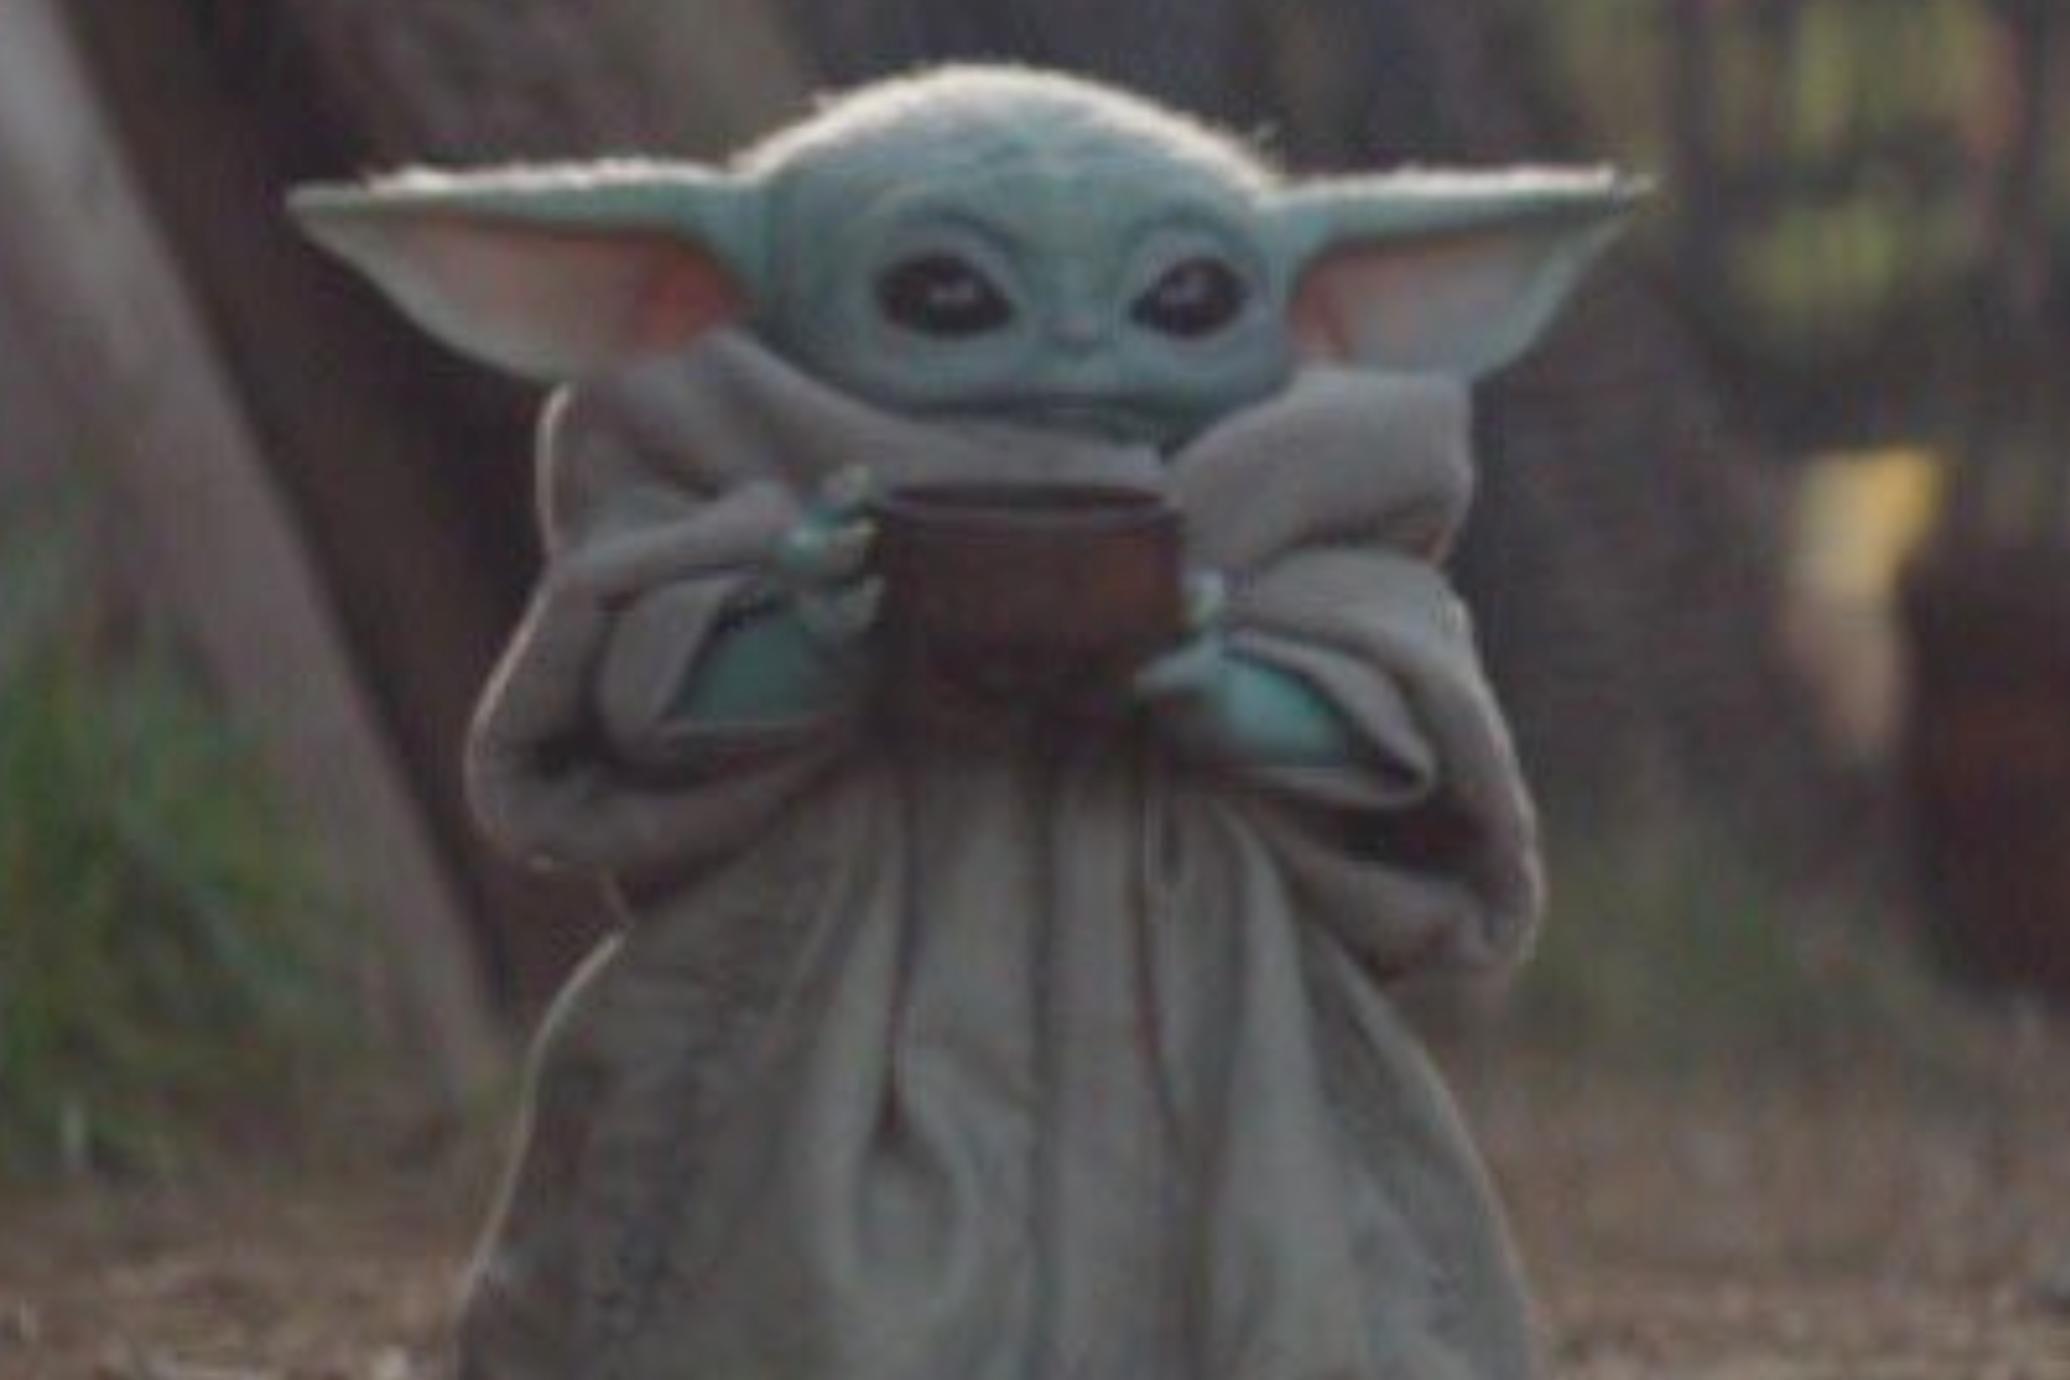 The Mandalorian S Baby Yoda Cup Meme Has Taken Over Twitter Yoda Meme Memes Tea Meme